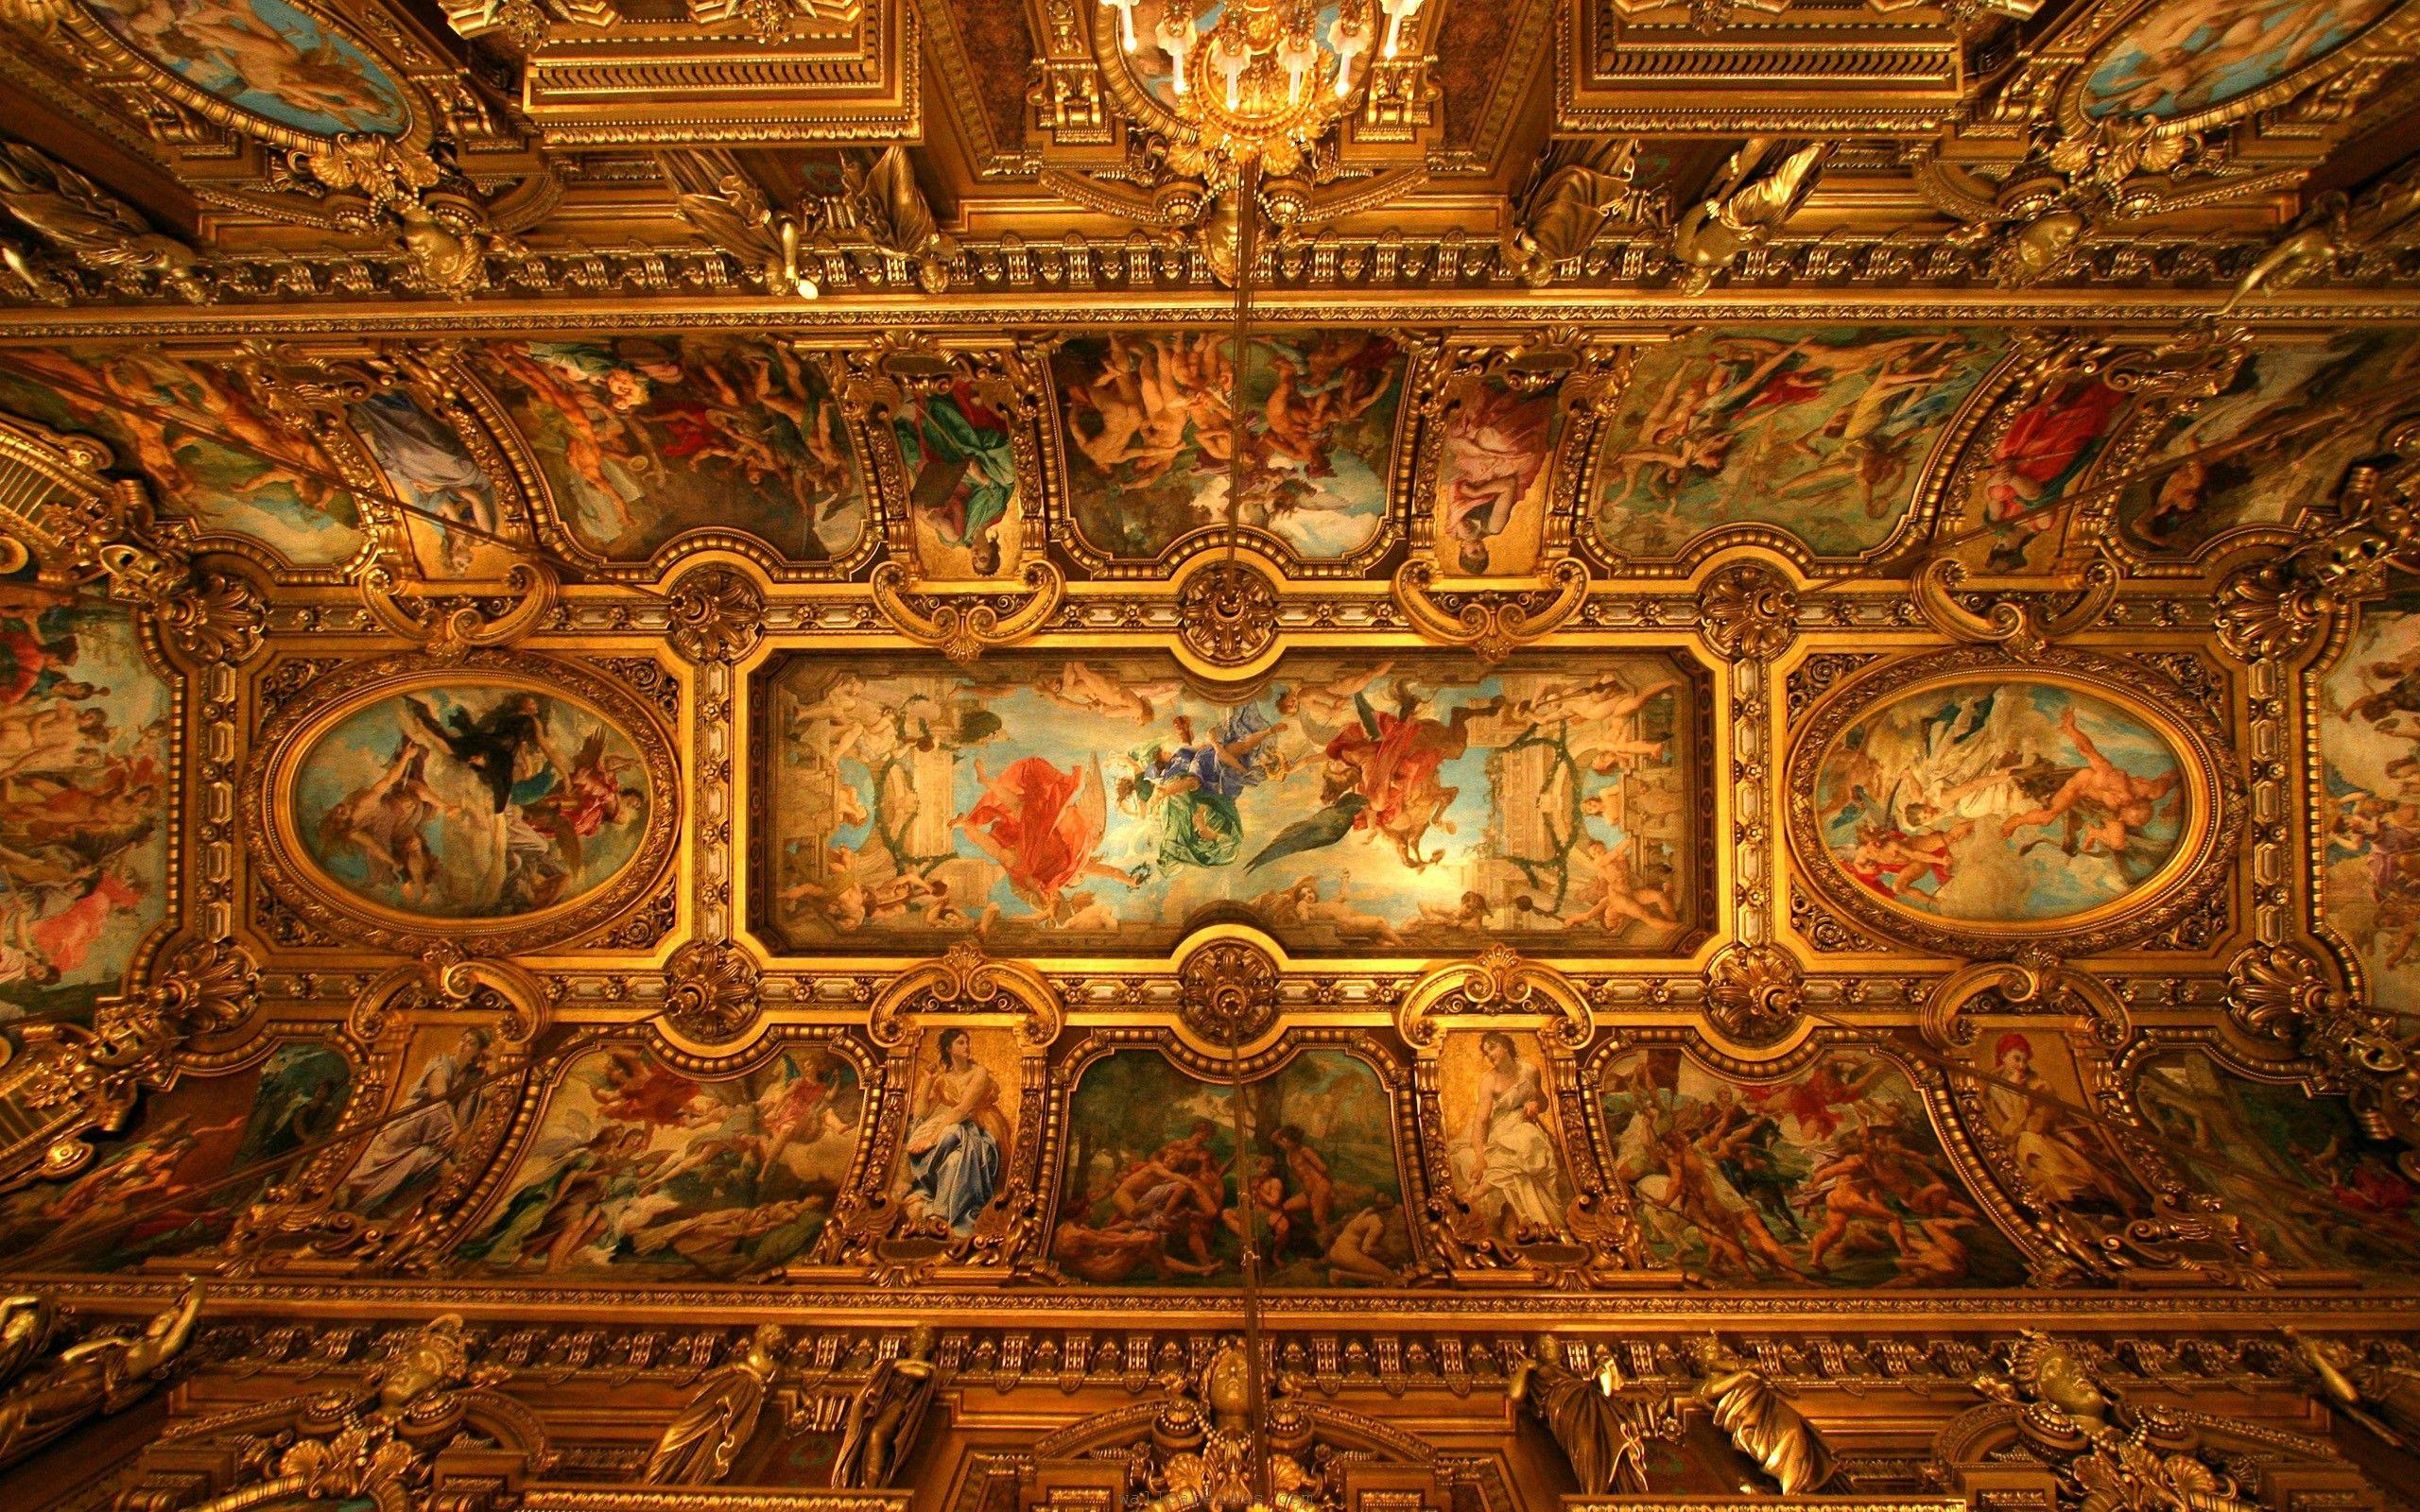 Michelangelo Wallpapers HD | Wallpapers | Pinterest ...